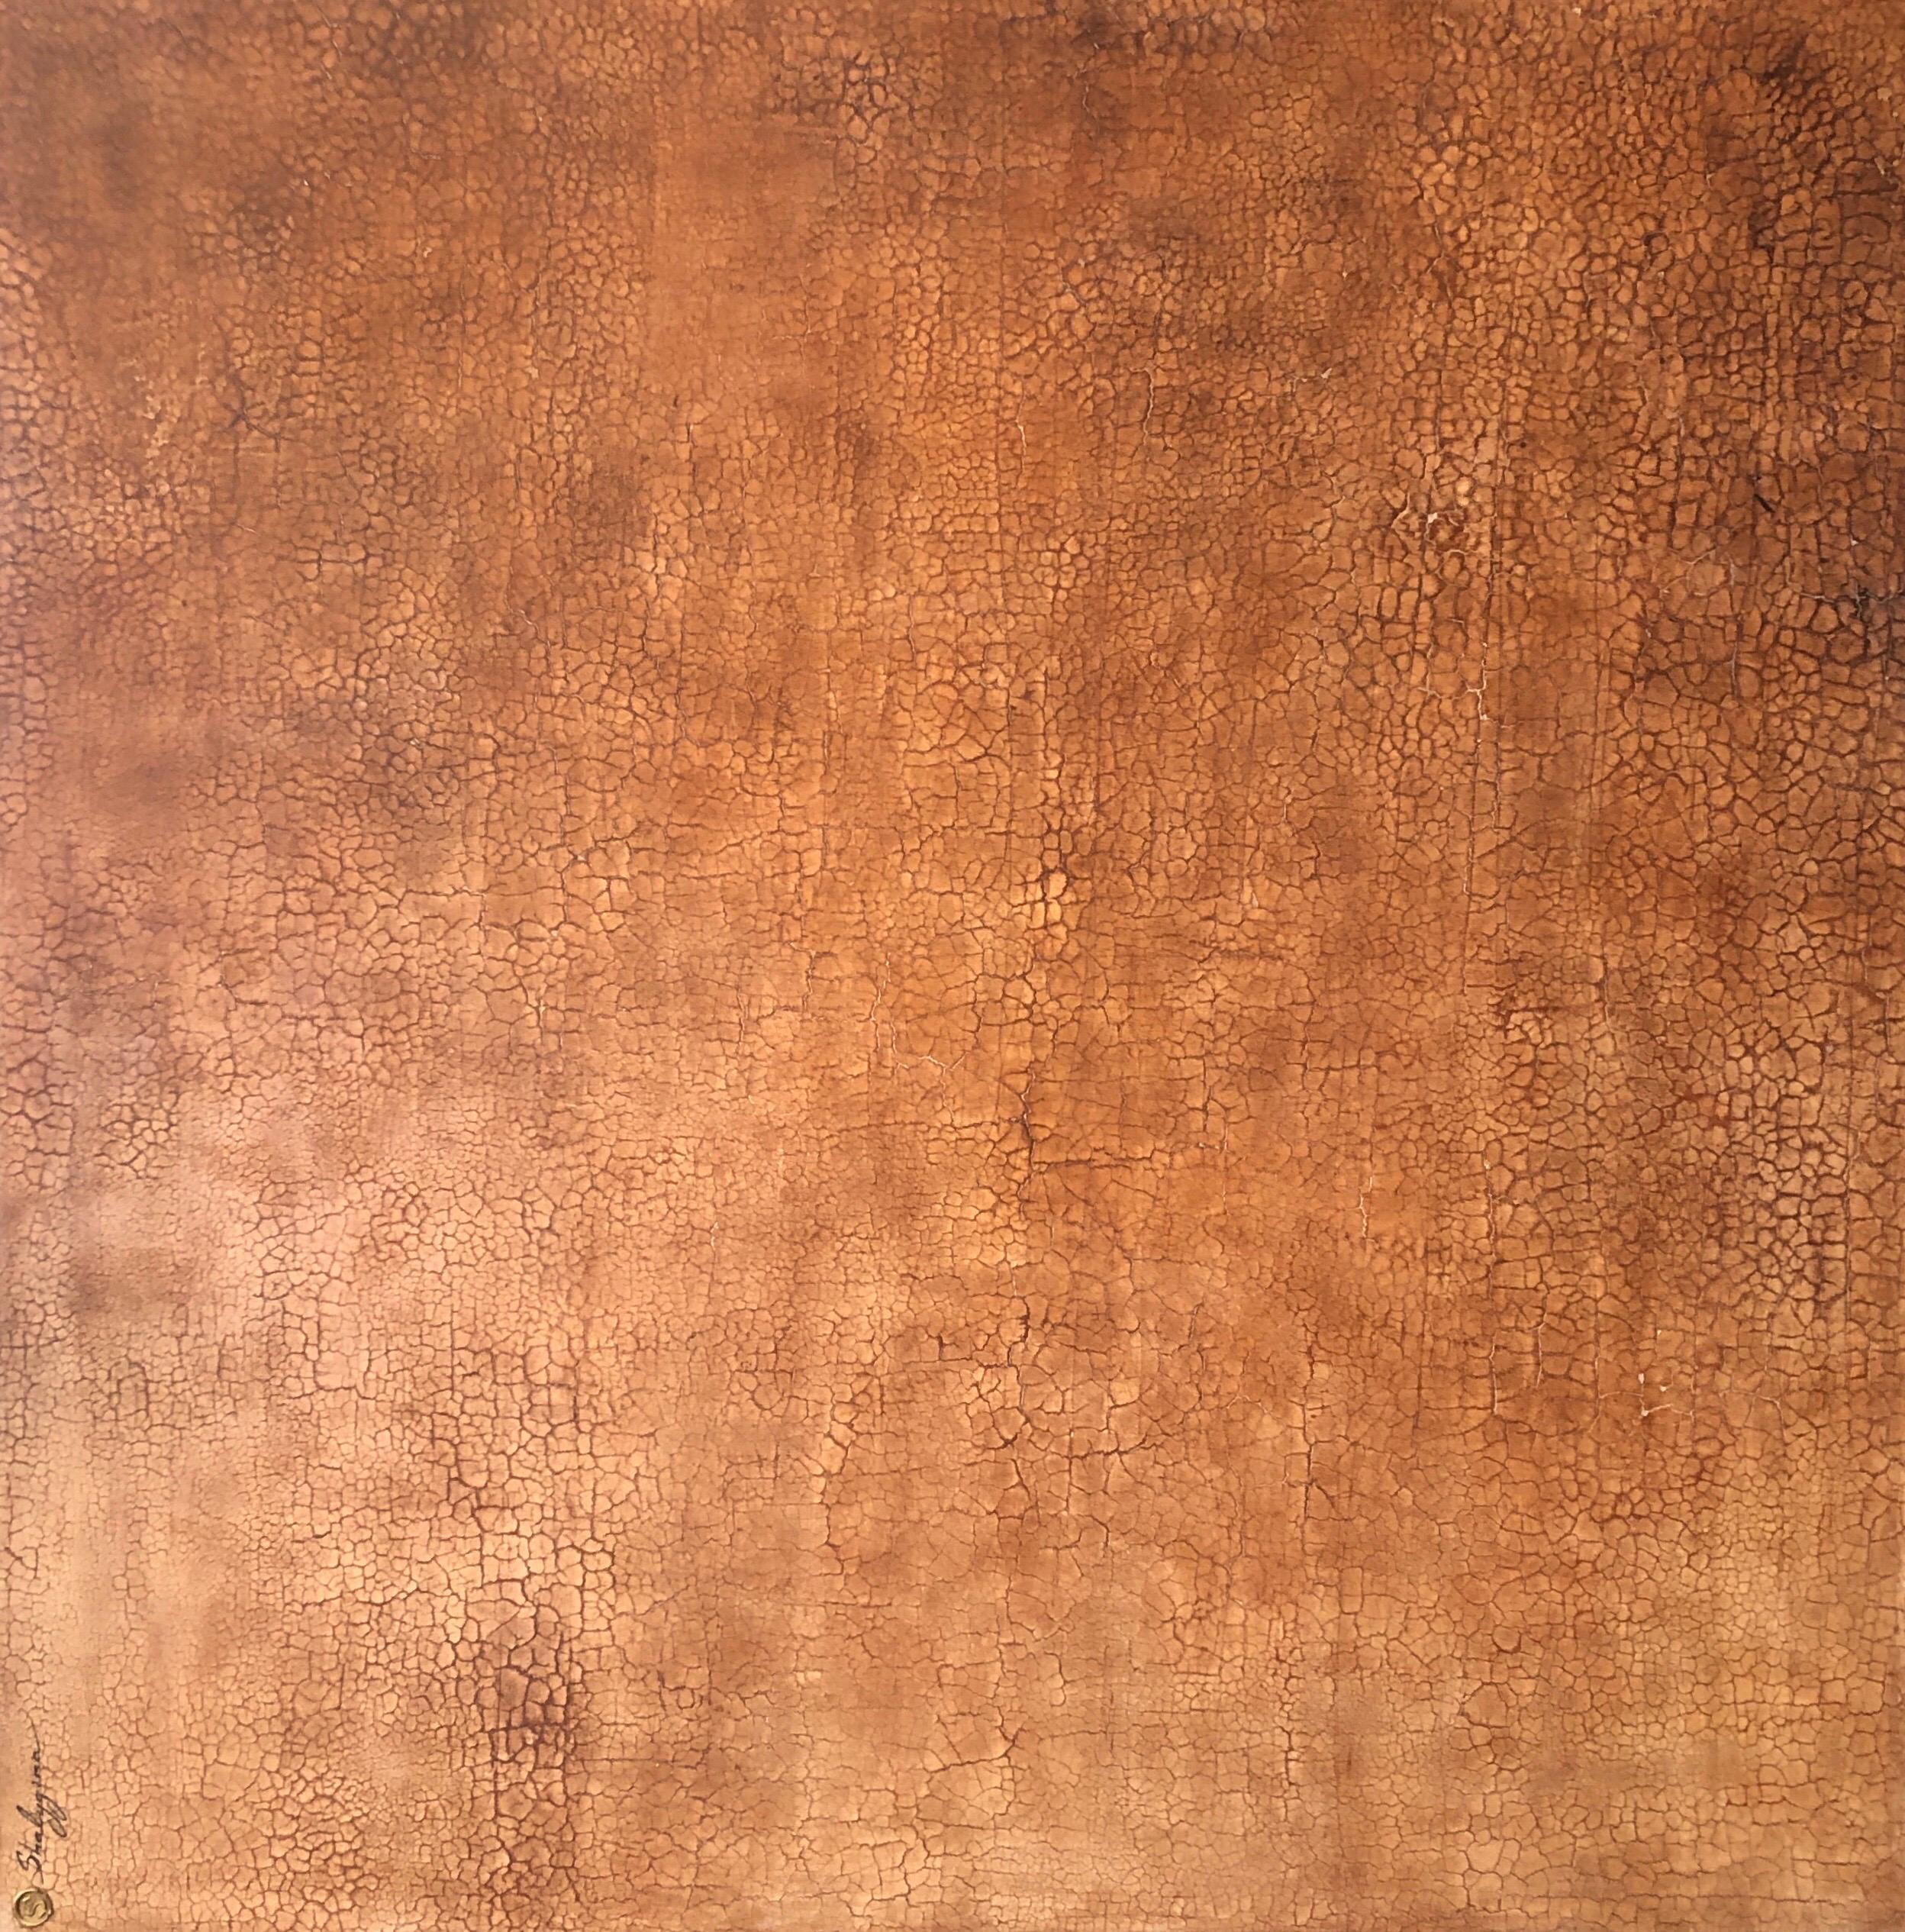 Burnt Orange Monochrome Minimalist Large Textured Abstract Painting 48x48